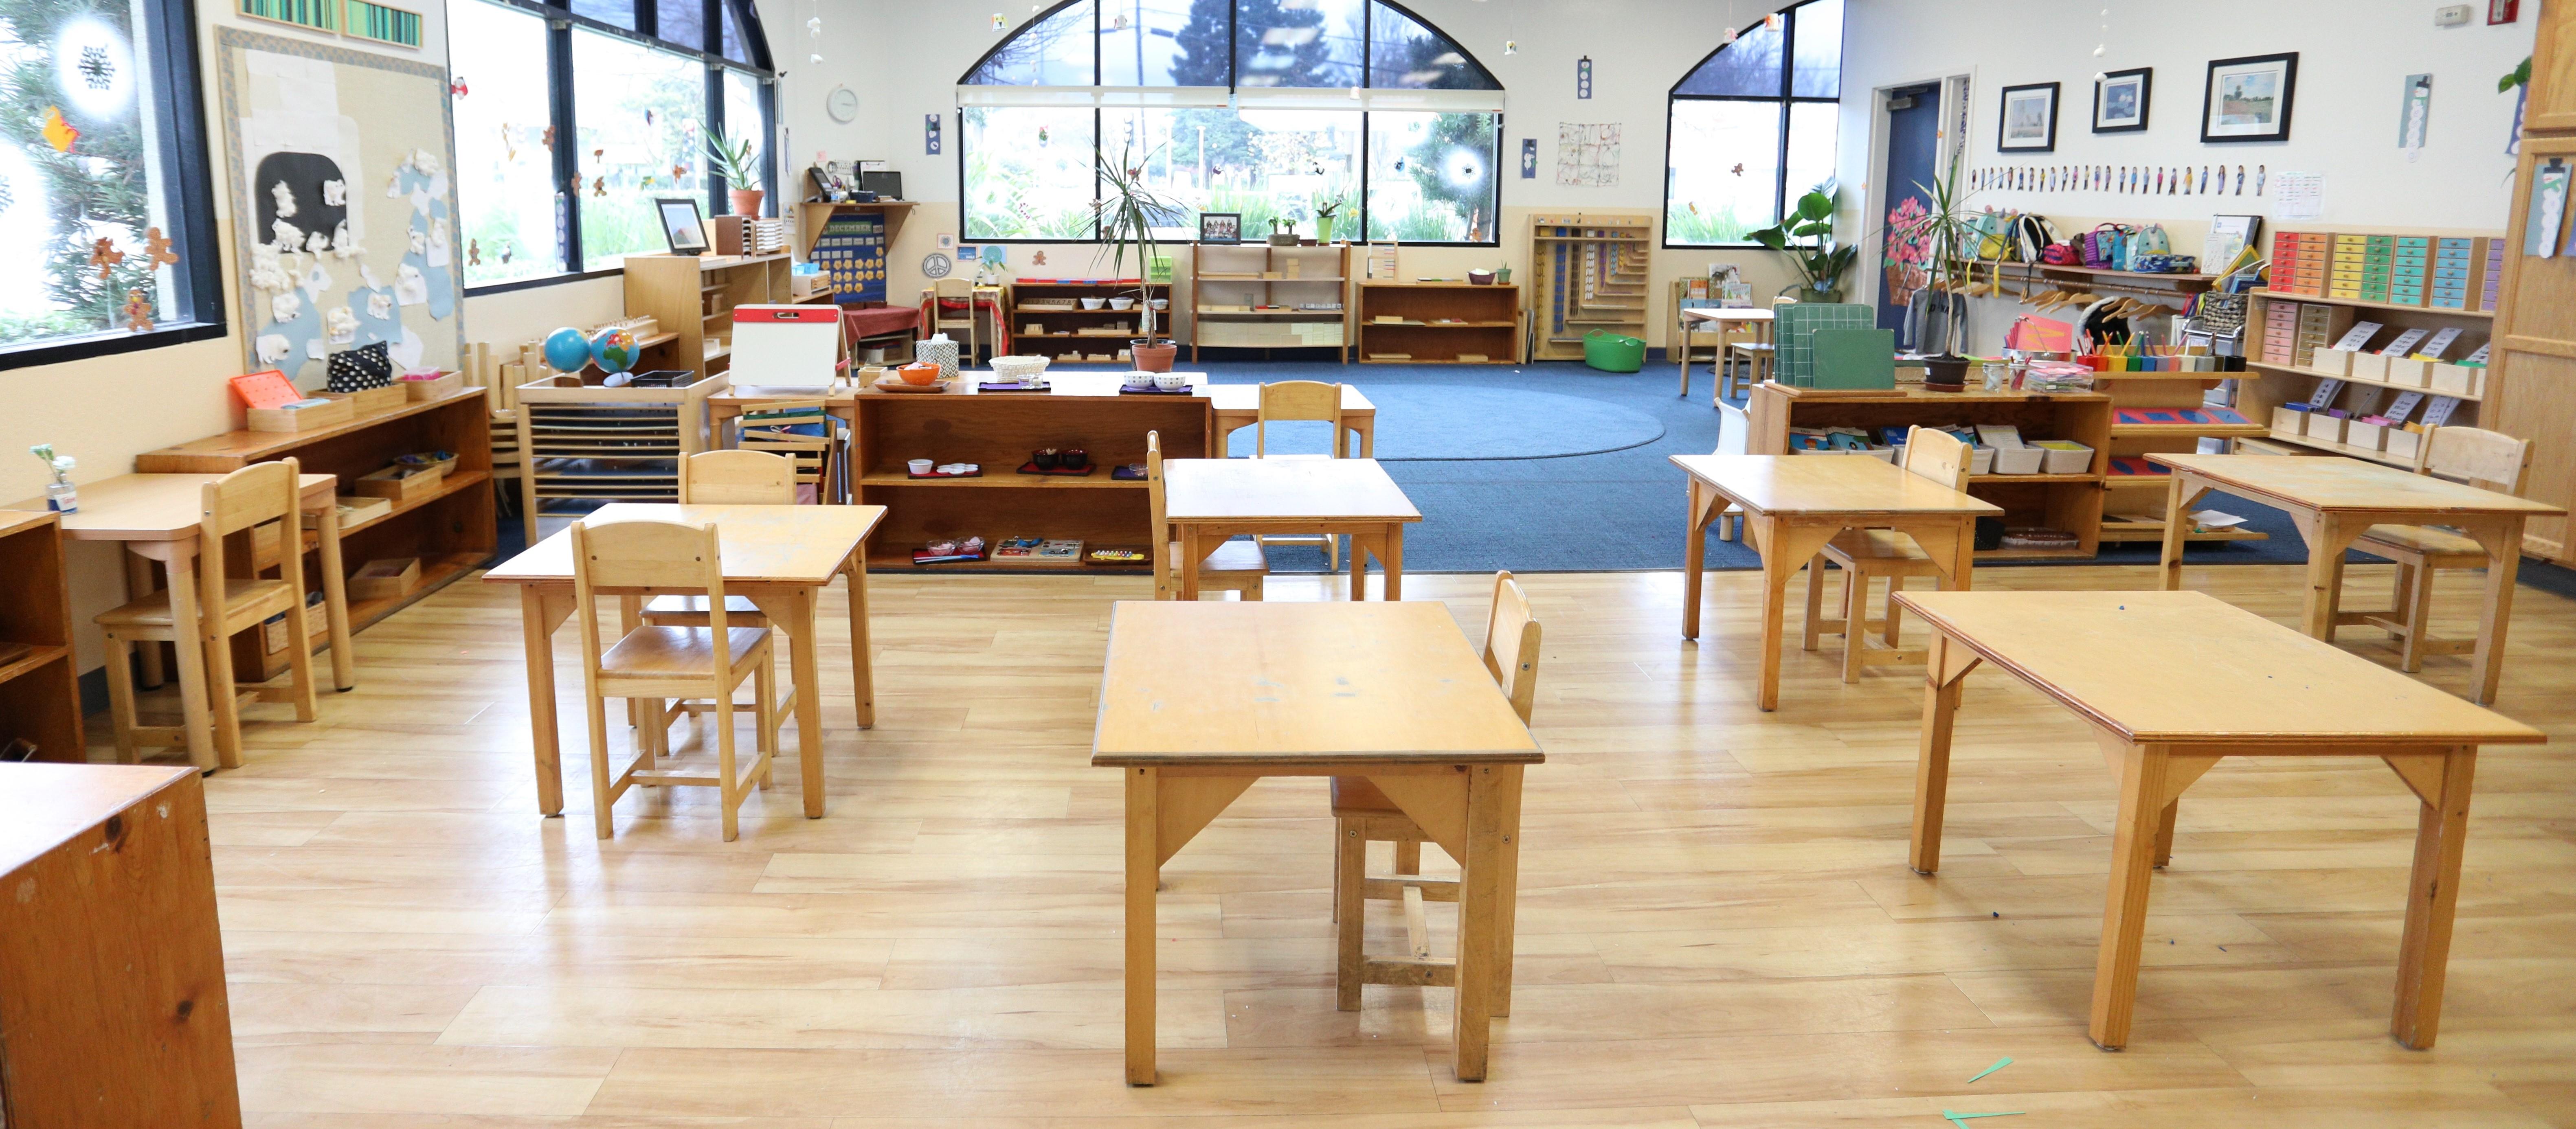 The Montessori Classroom Community - Montessori School of Silicon Valley: Milpitas Santa Clara ...